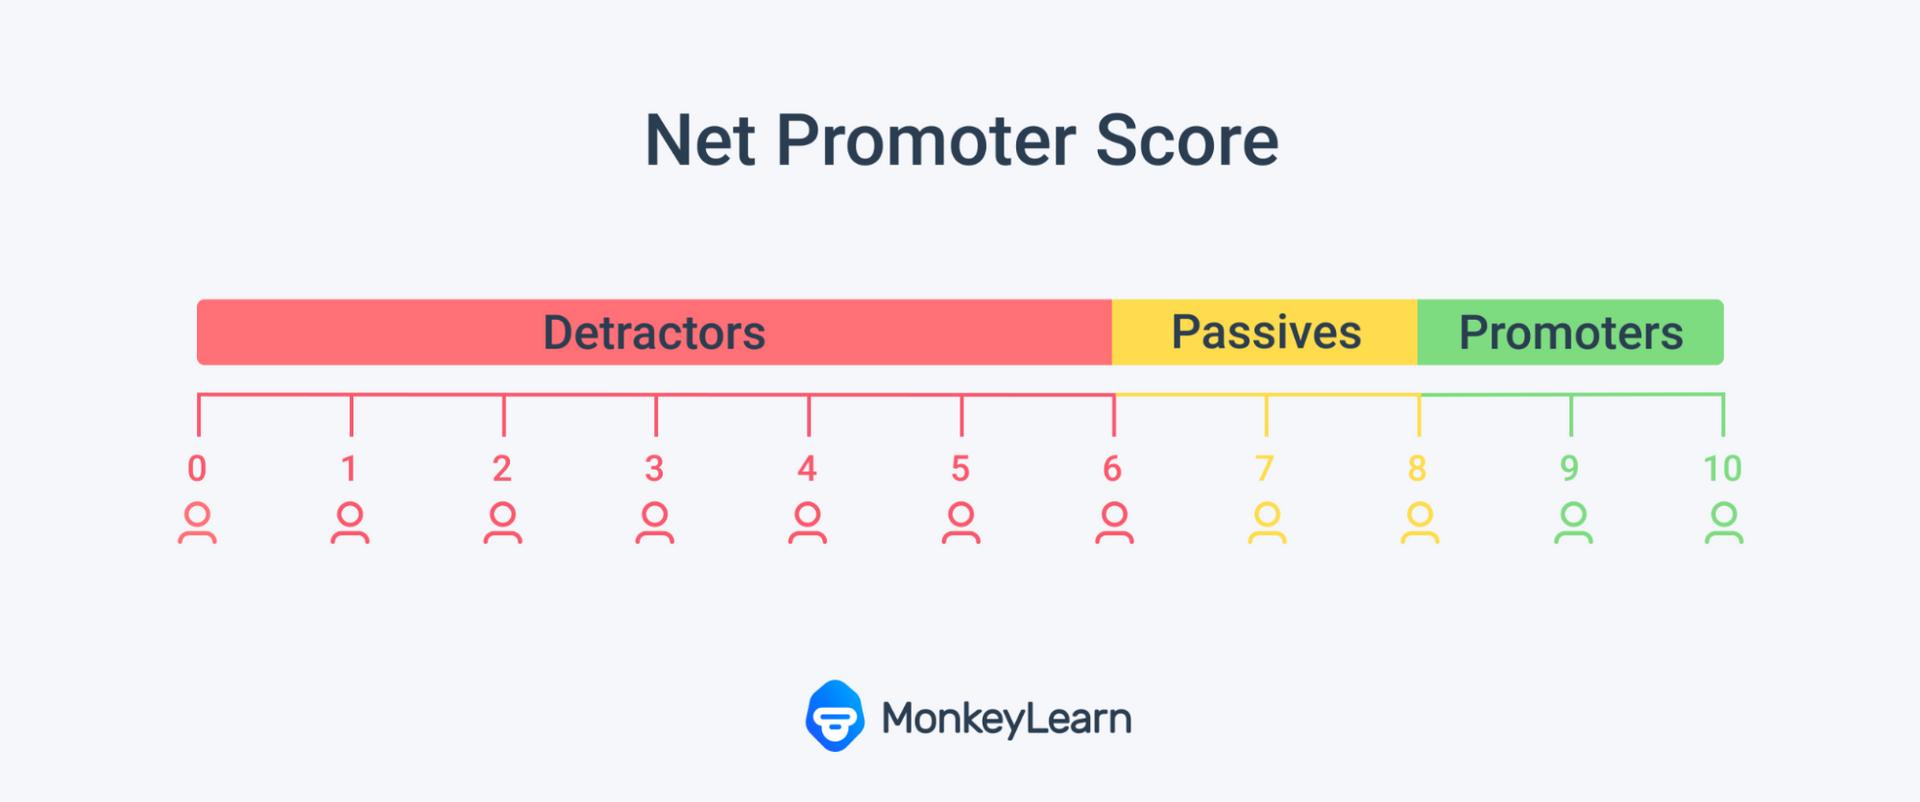 detractors passives promoters